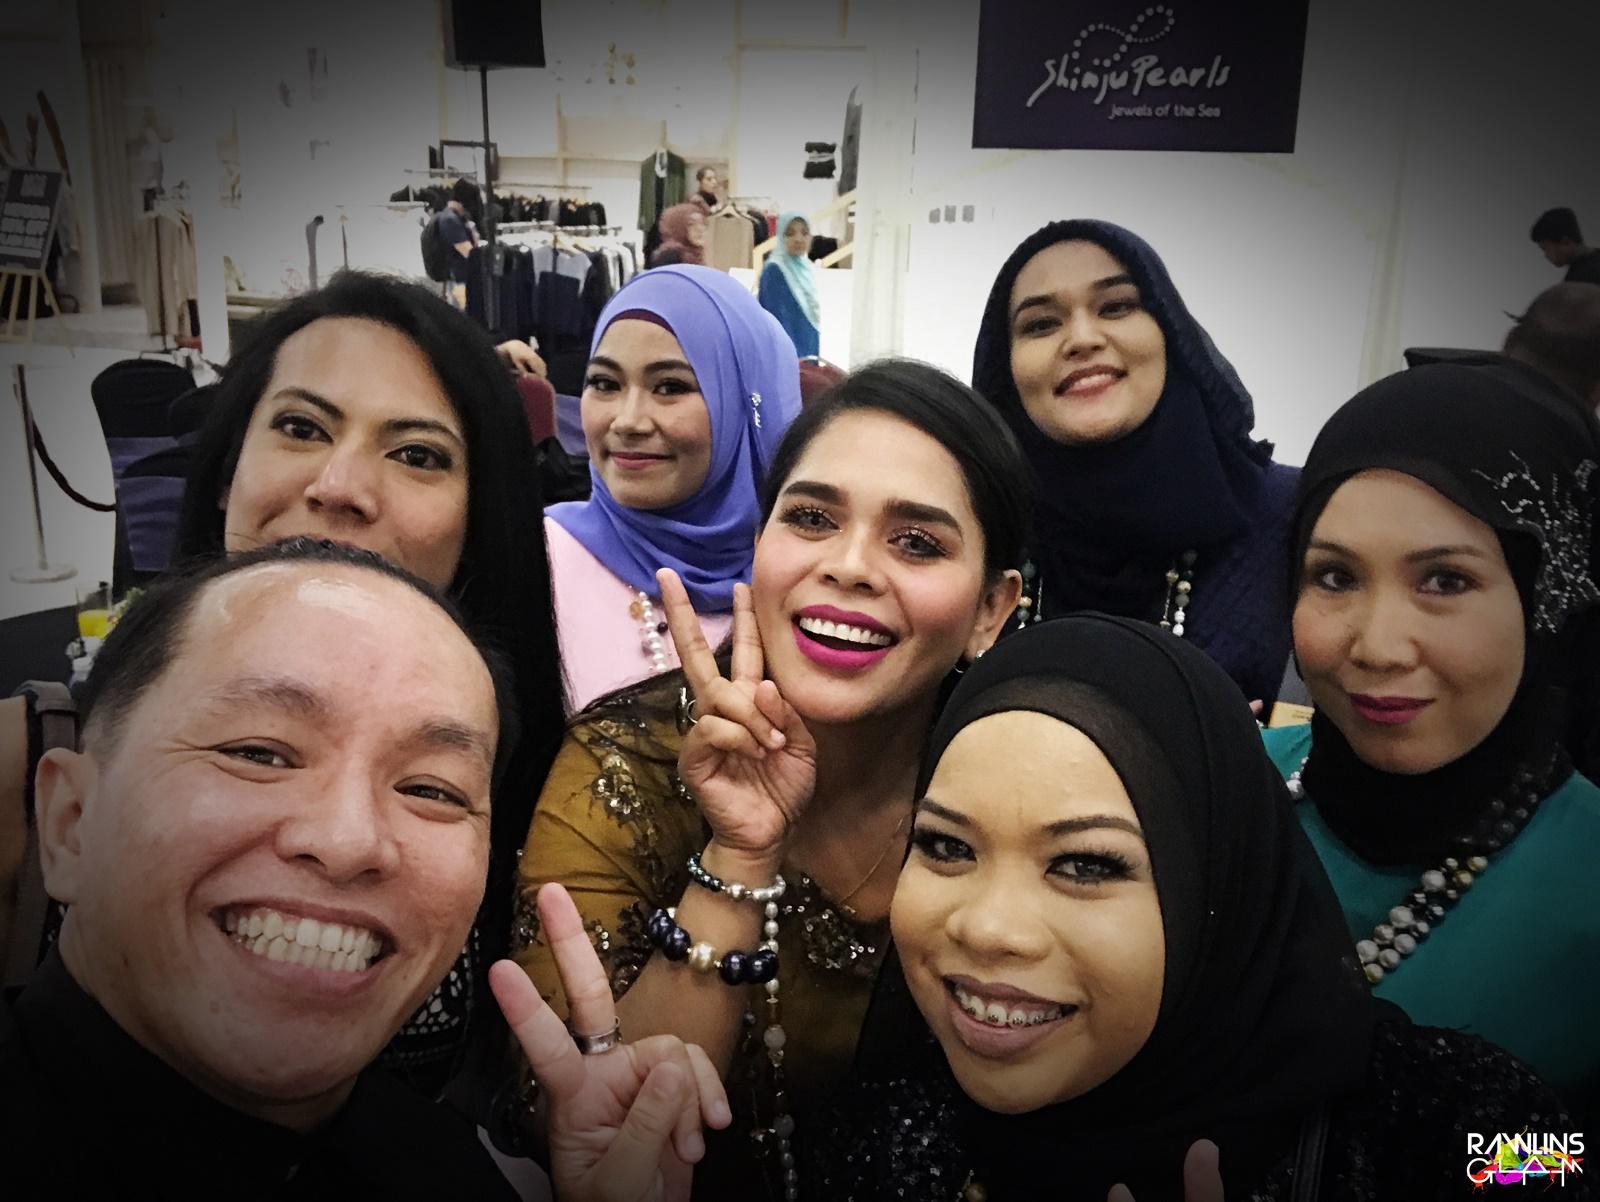 Shinju Pearls, Pearls, Jewelry, Rawlins GLAM, Zainal Abidin, Salma Mentor, Reyhana Yunus, Ayu Damit, Christina Toh